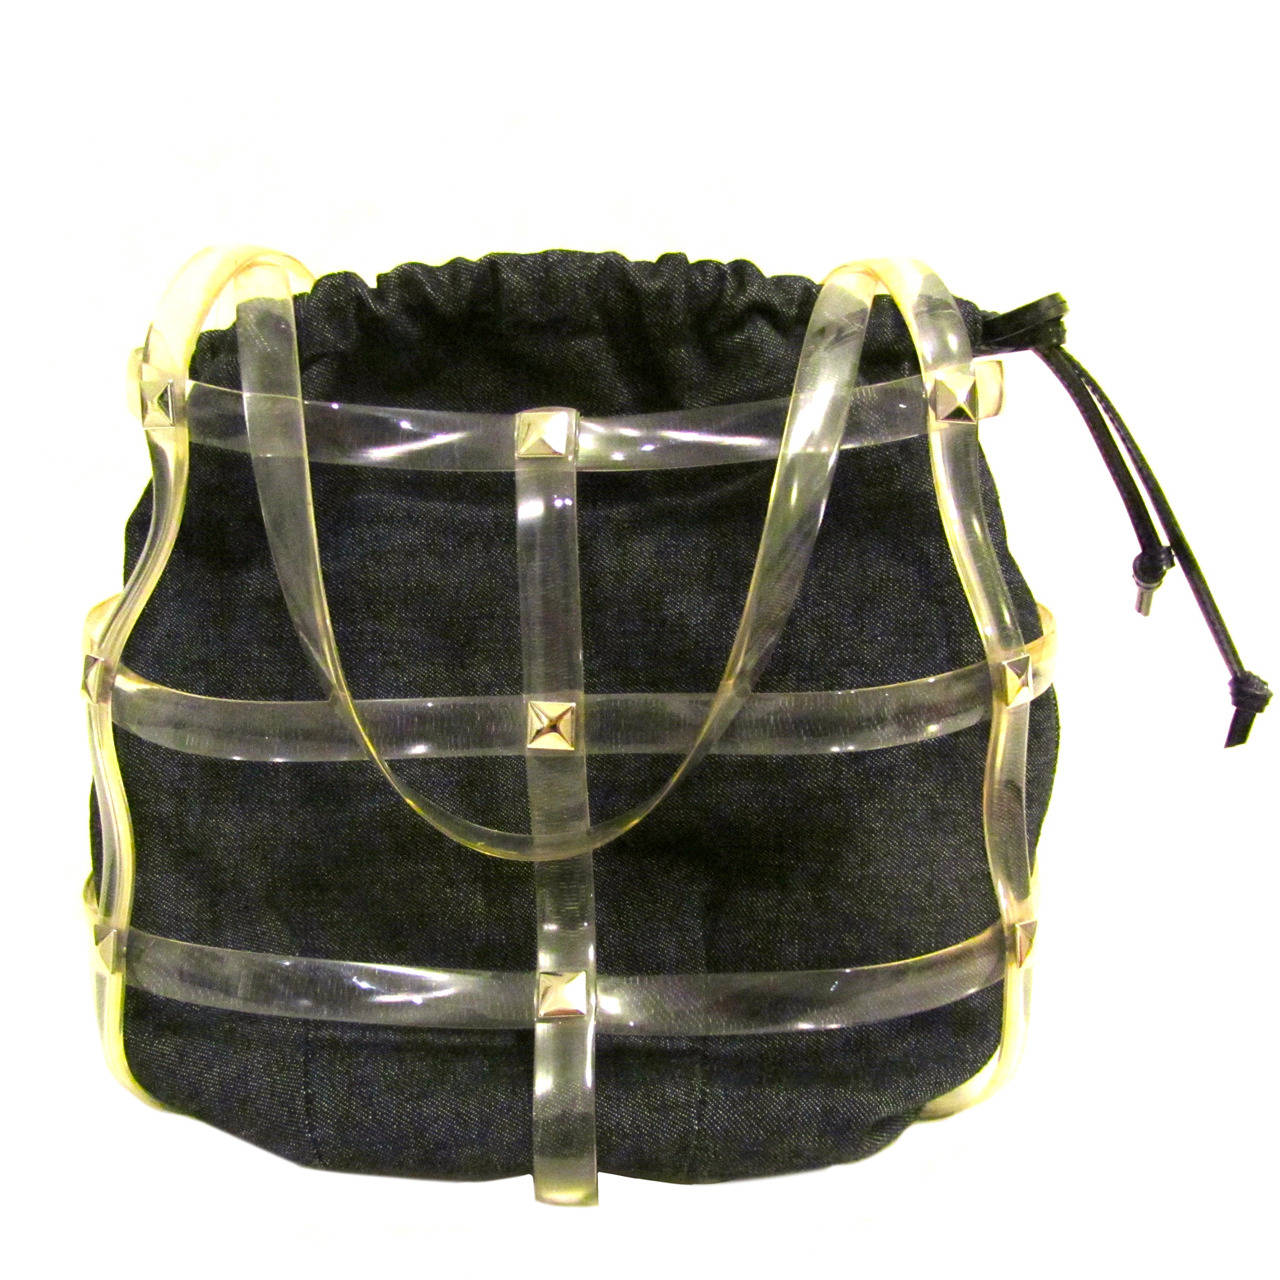 1980s Paco Rabanne Denim and Clear Plastic Handbag - Drawstring Pouch